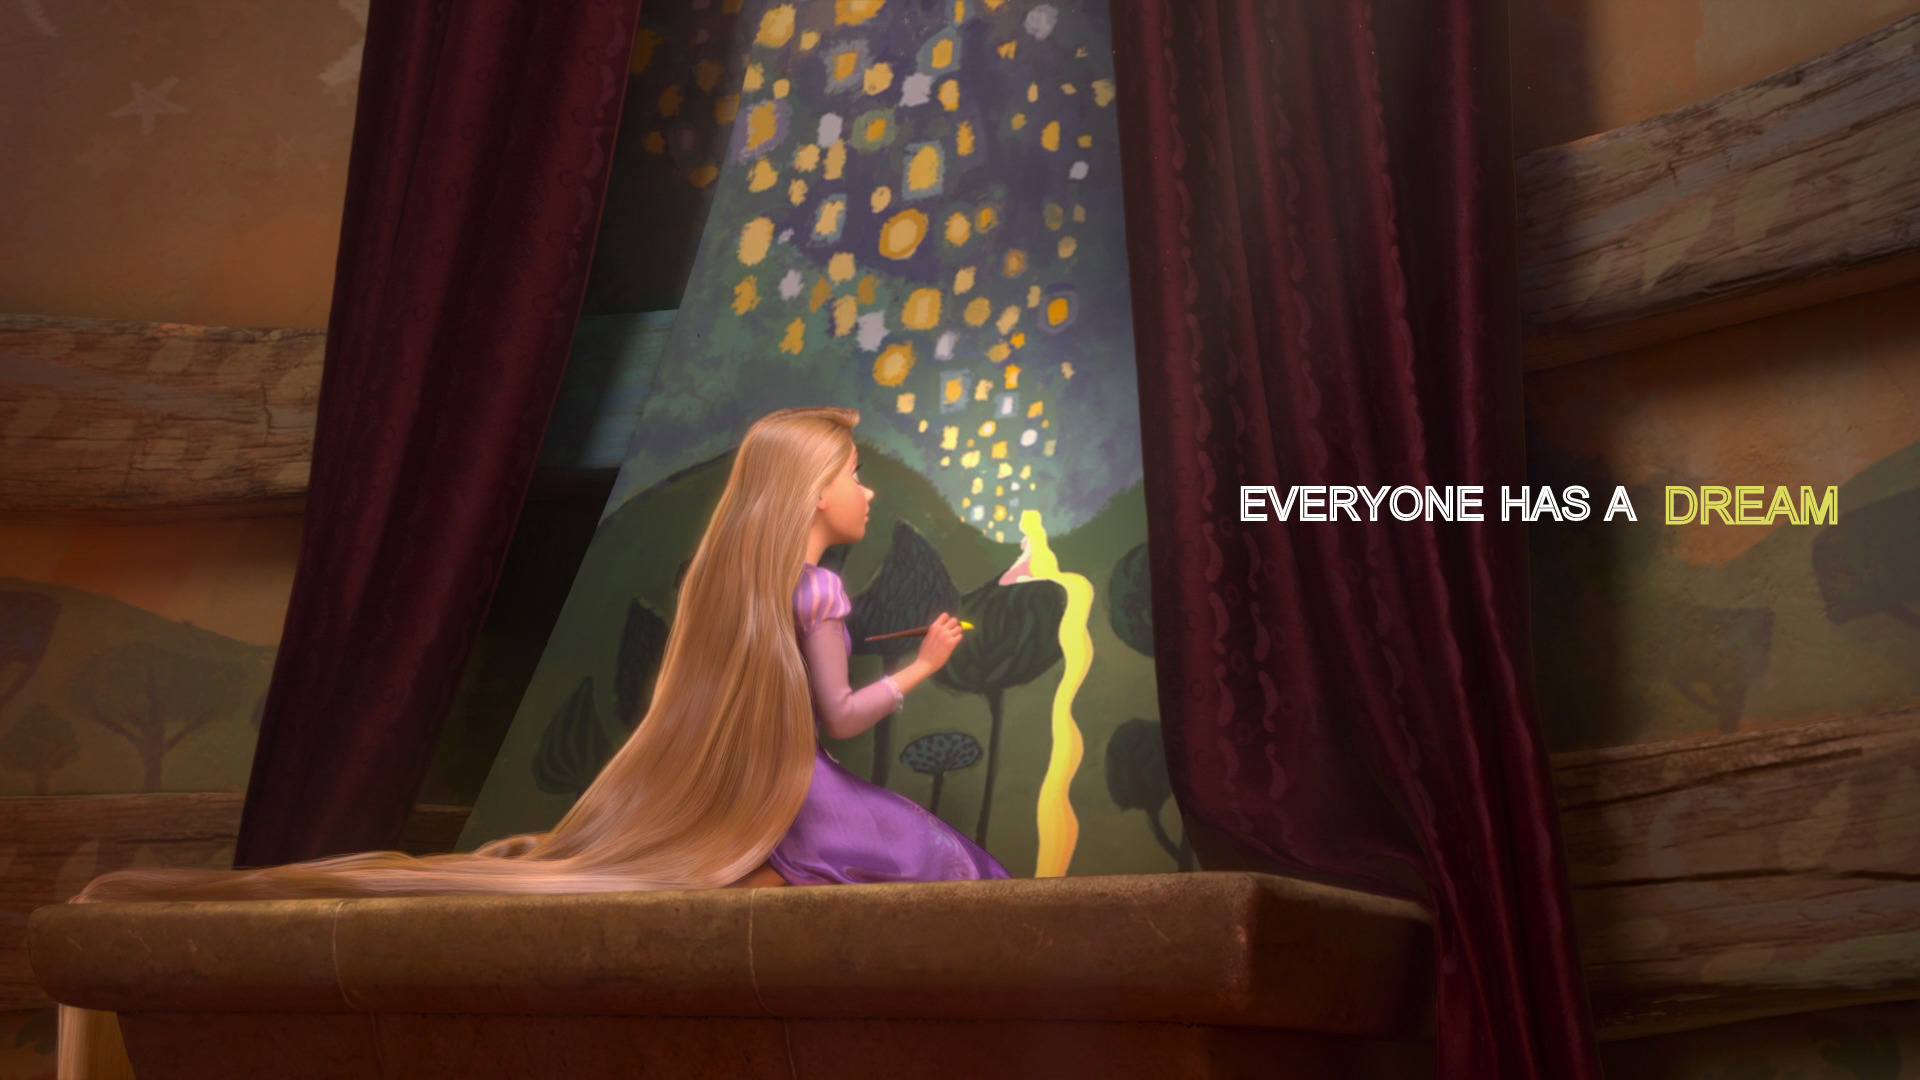 Everyone has a dream